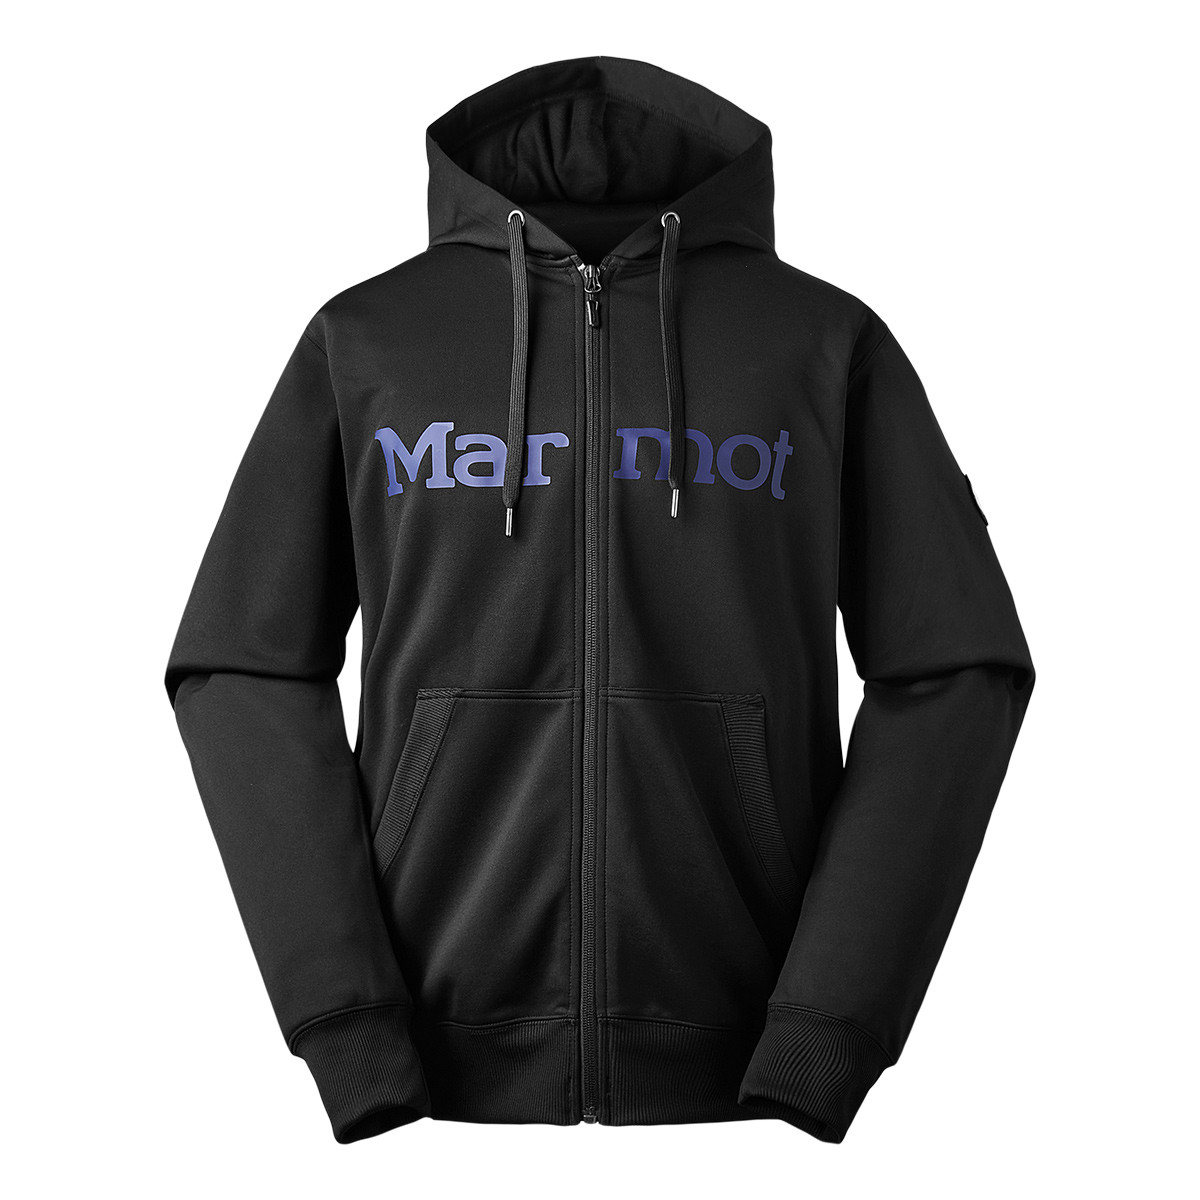 Marmot 土拨鼠 V51253001 男士运动卫衣